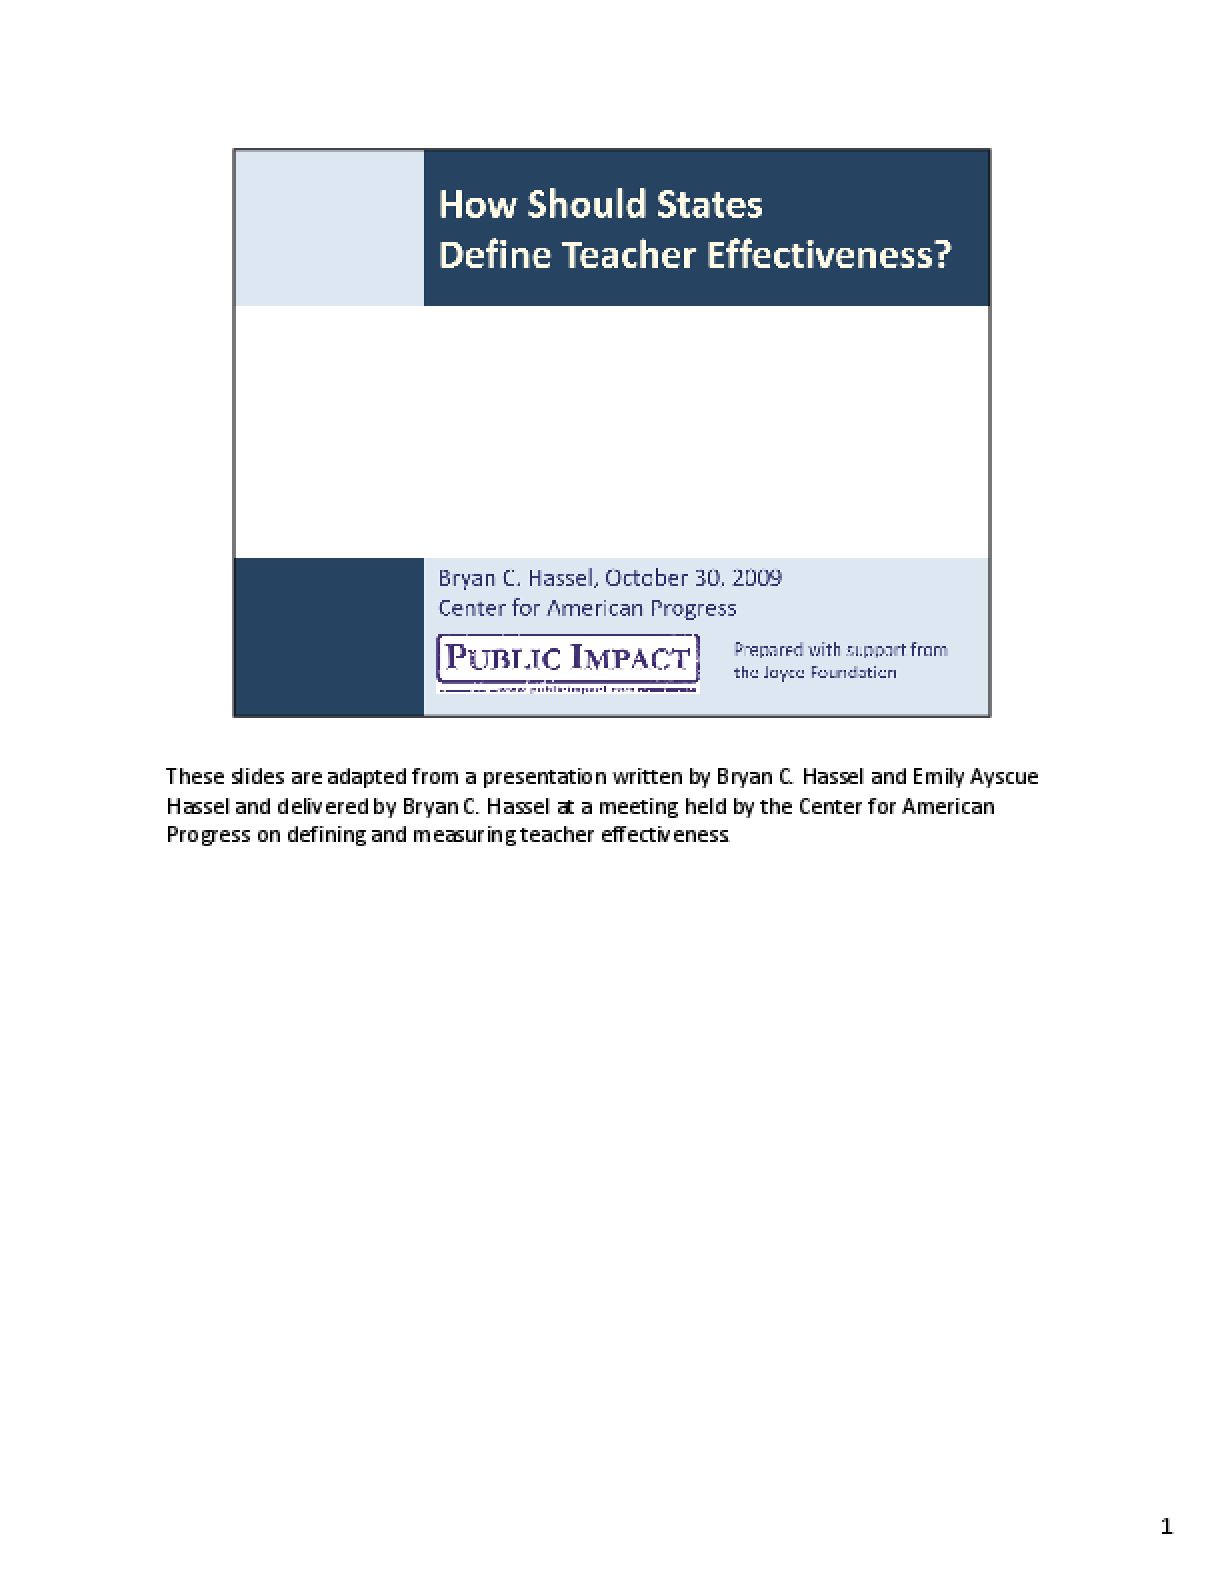 How Should States Define Teacher Effectiveness?